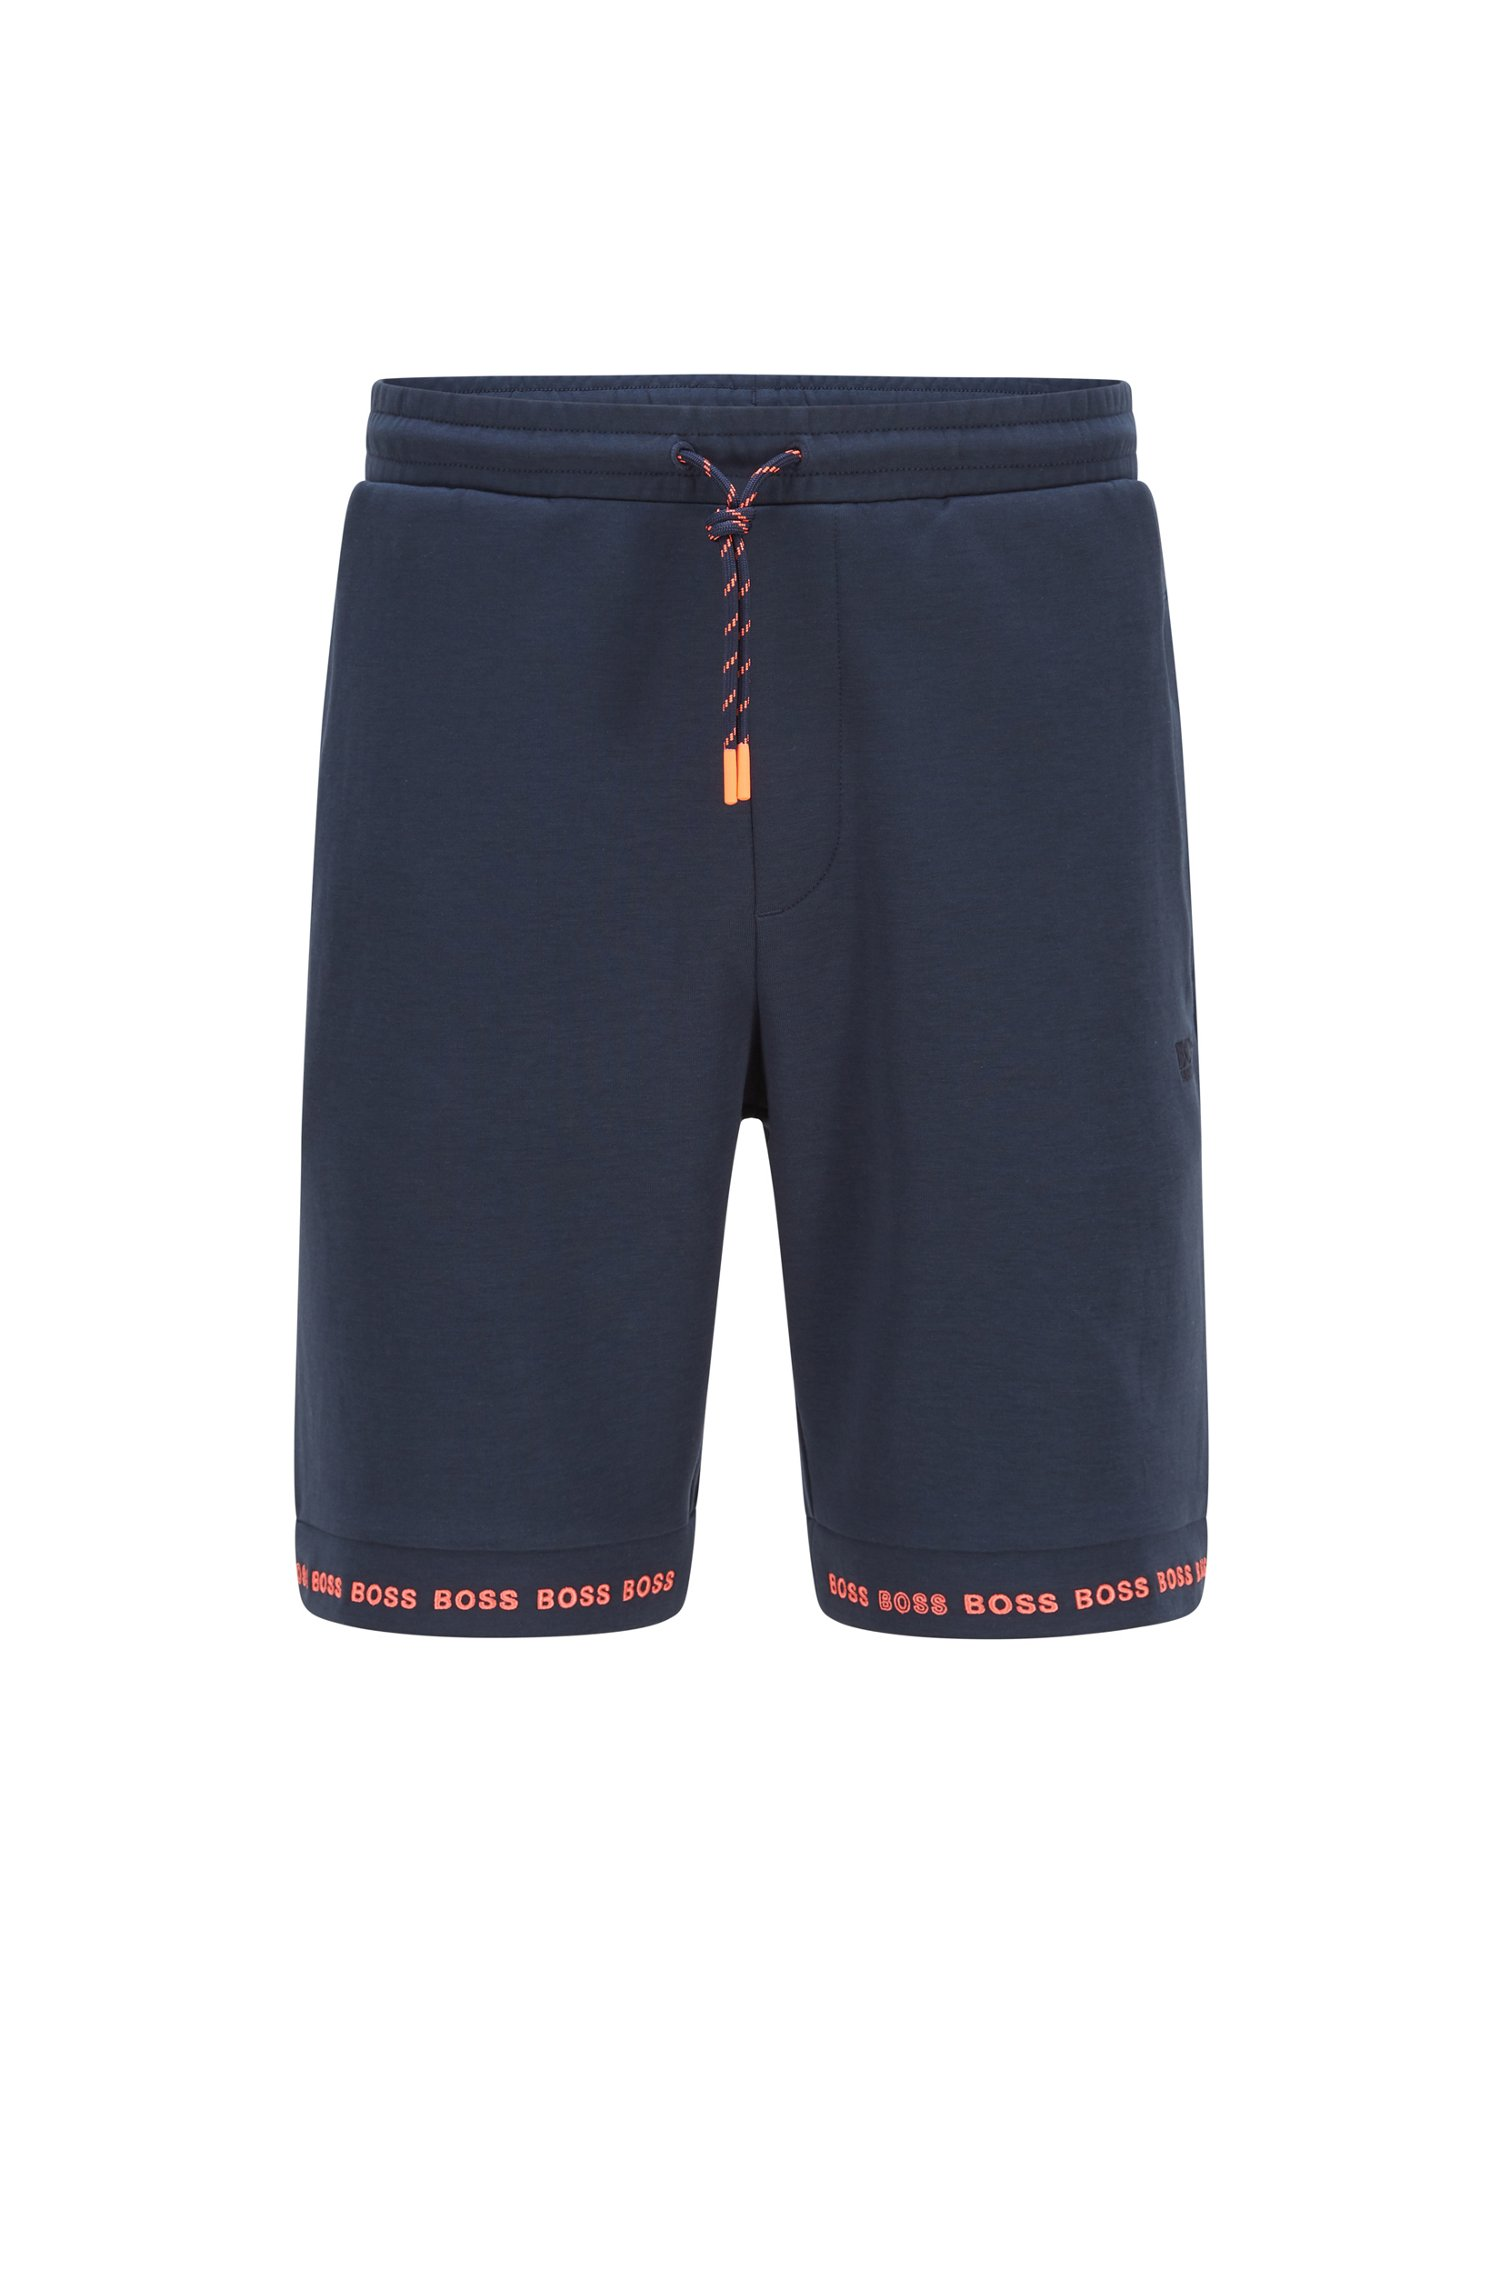 Regular-Fit Shorts aus Stretch-Jersey mit Logos am Saum, Dunkelblau